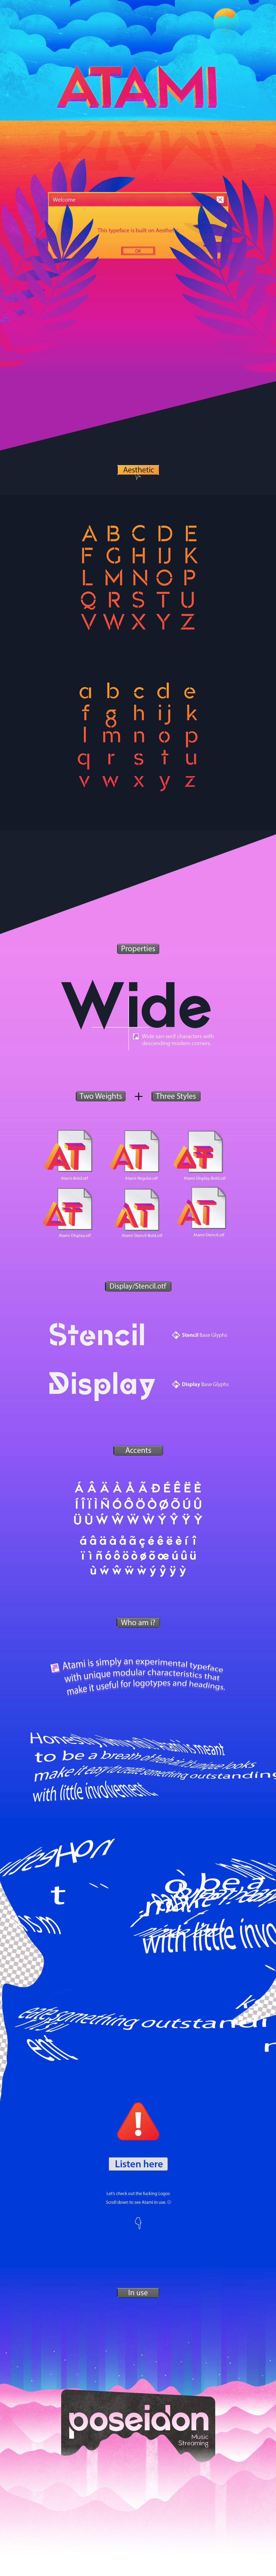 Atami - Free Typeface on Behance